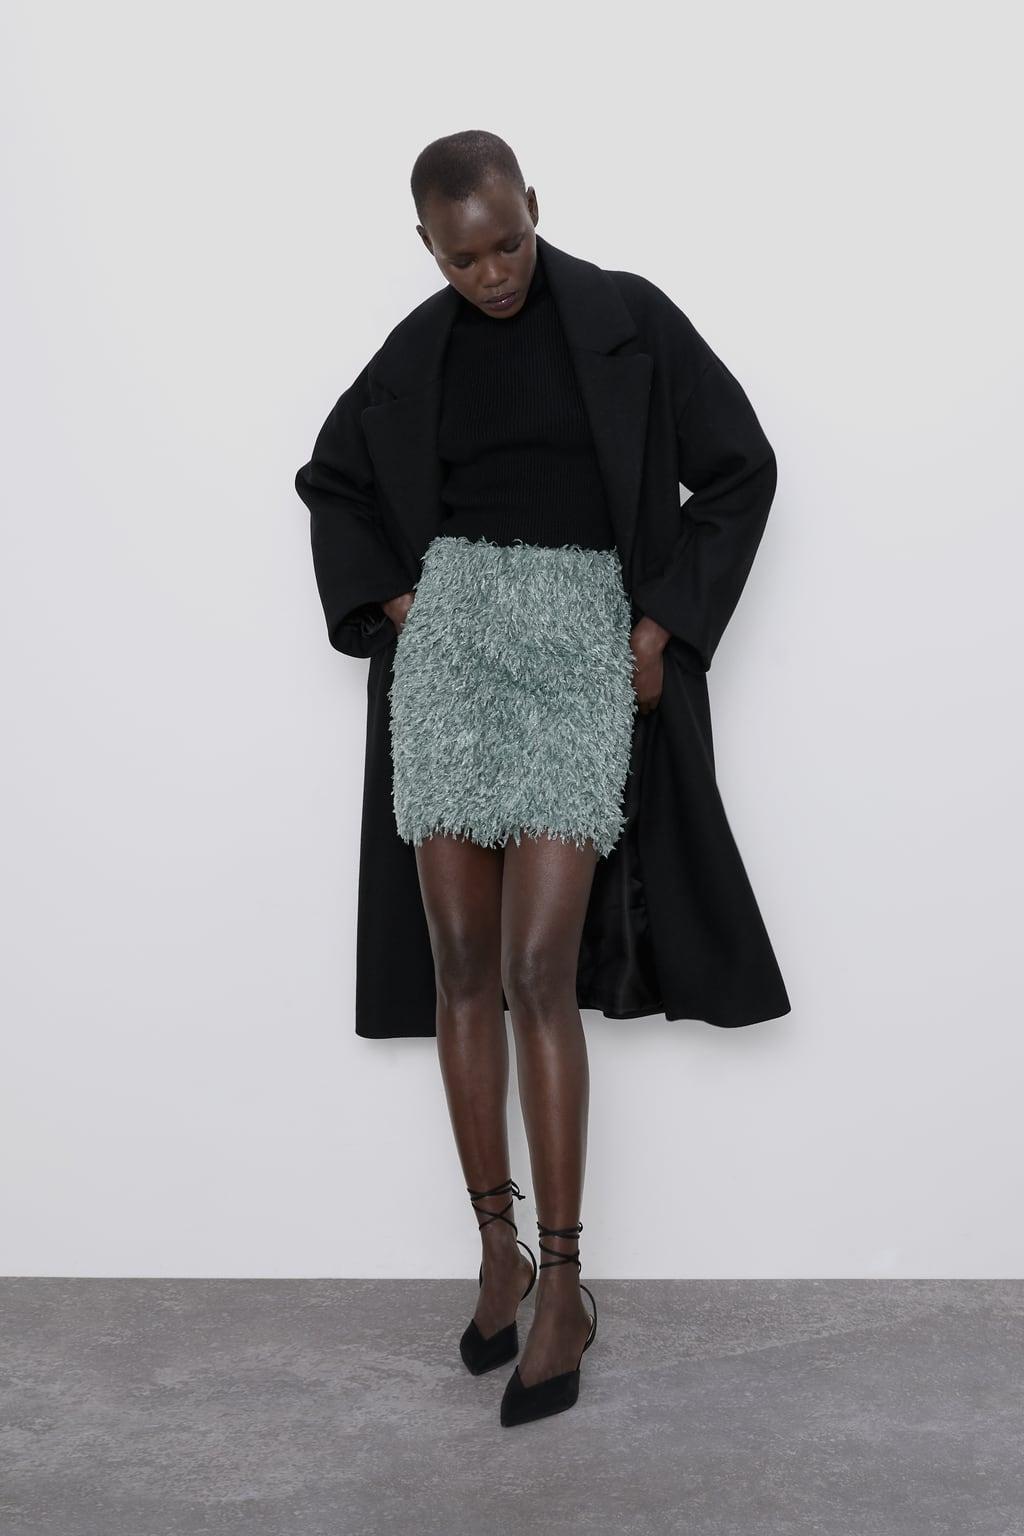 Immagine 1 di MINIGONNA EFFETTO PIUME di Zara